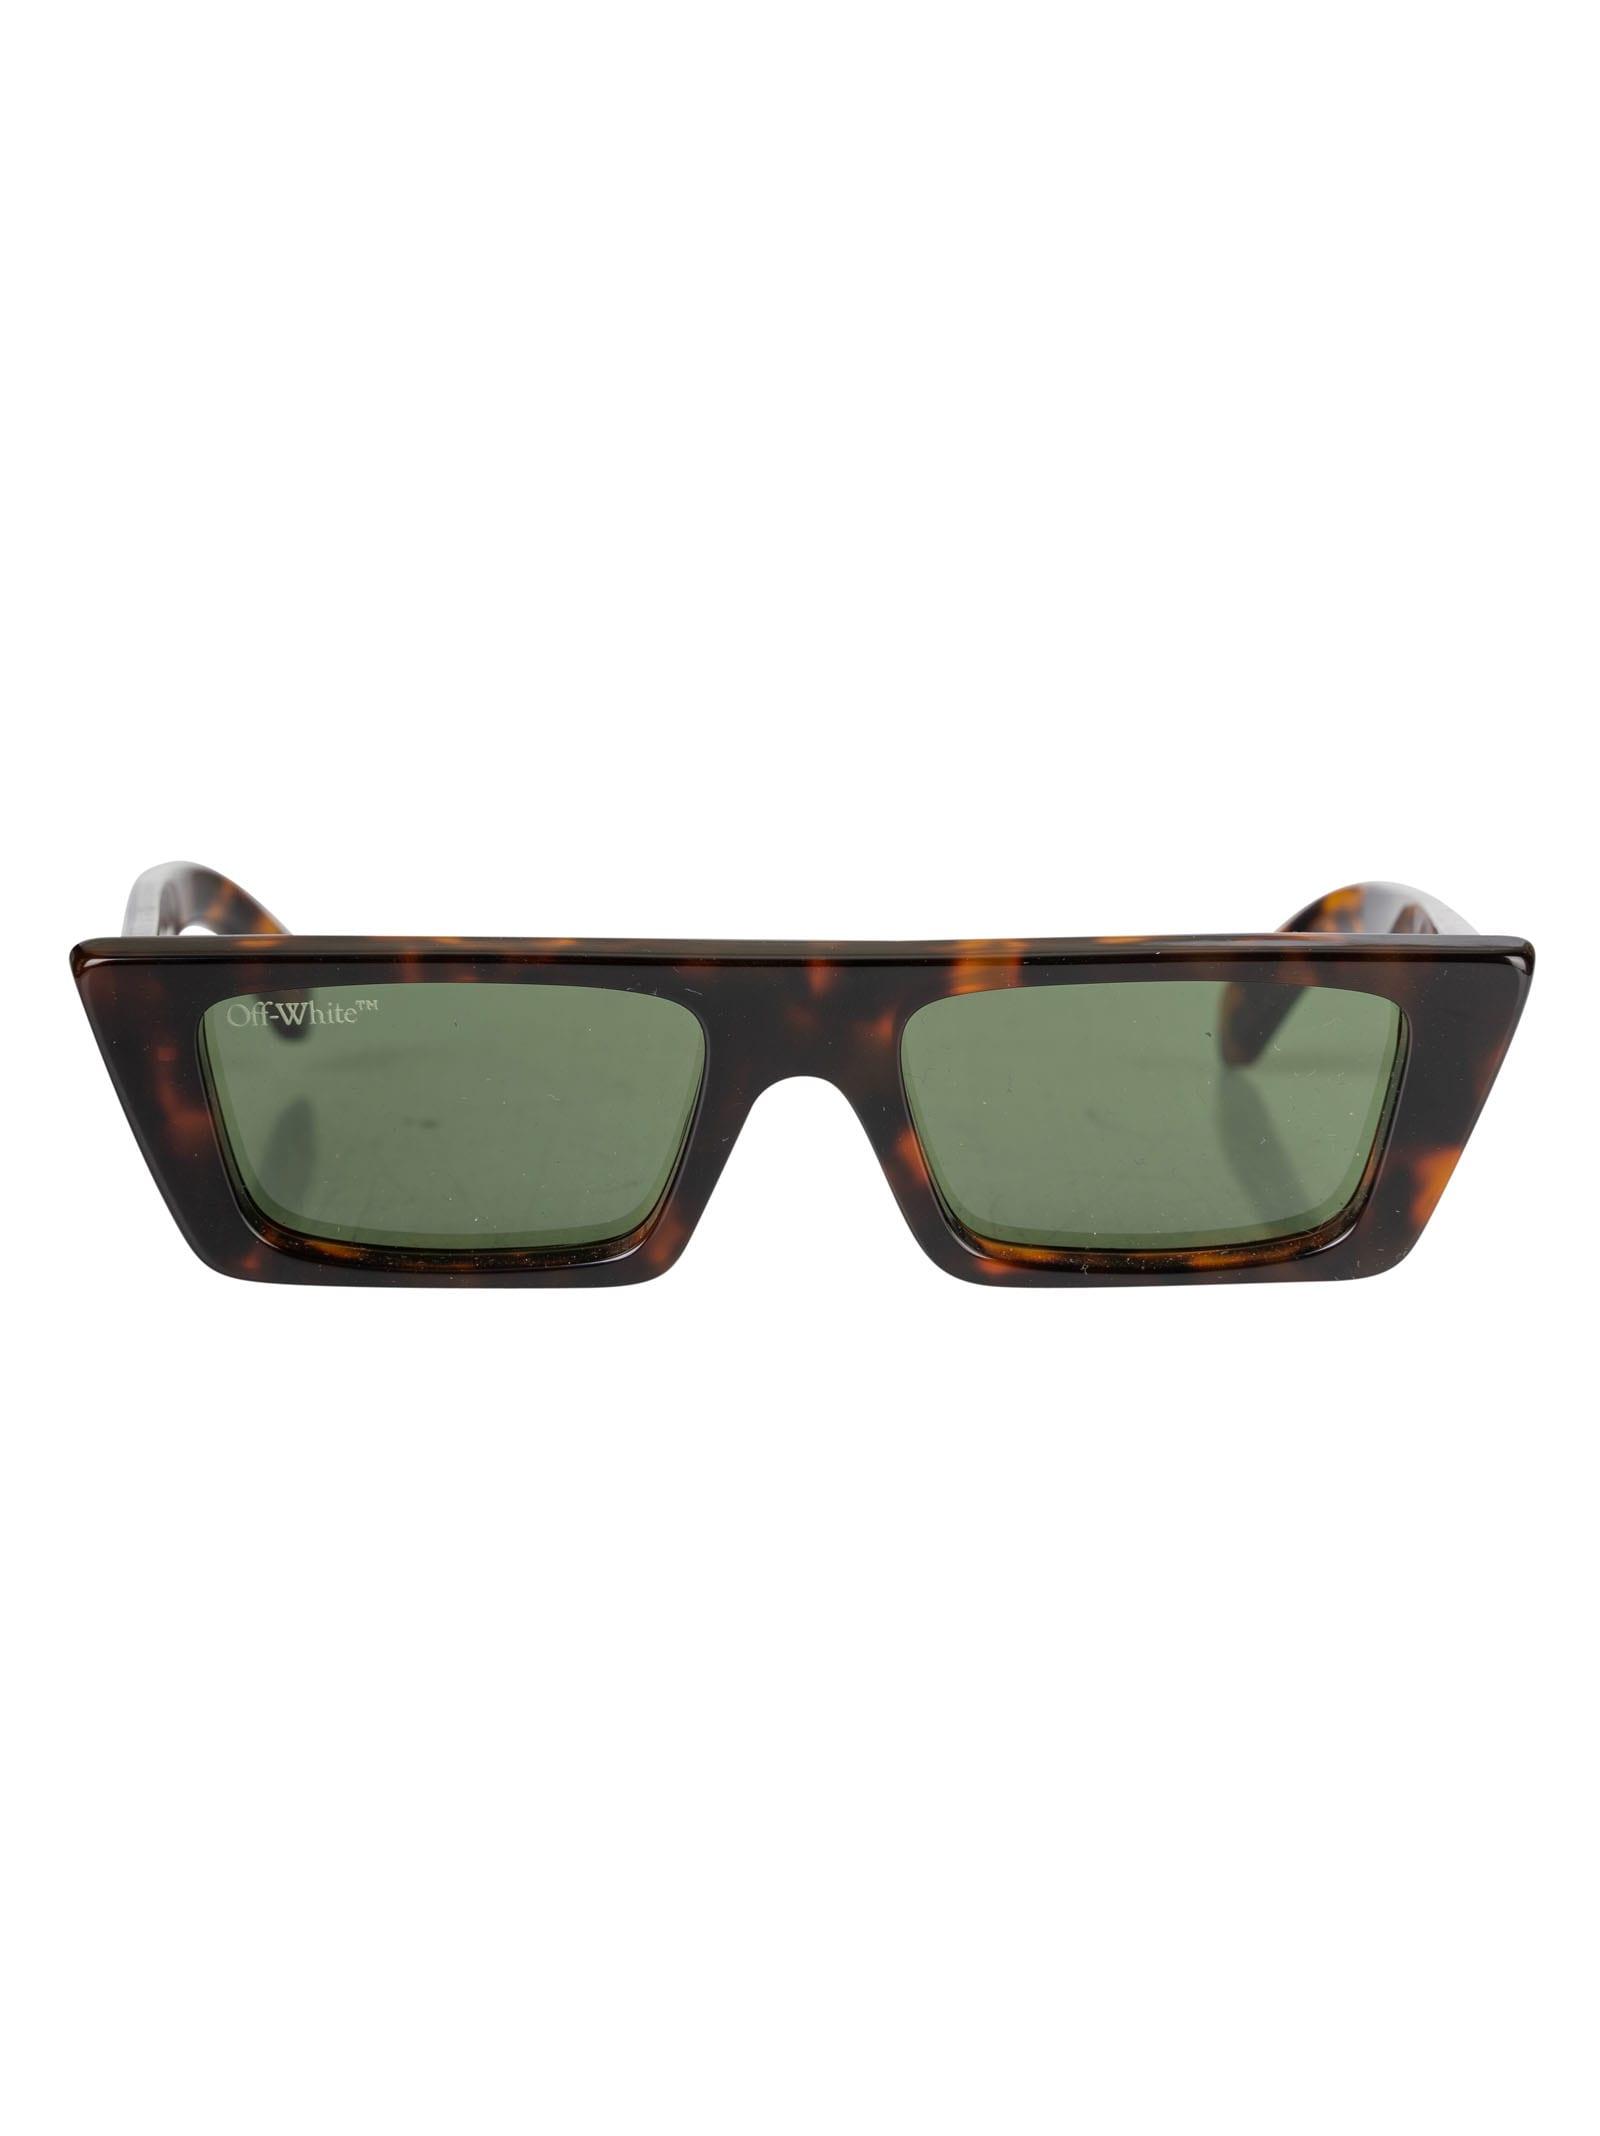 Off-white Marfa Sunglasses In Brown/green